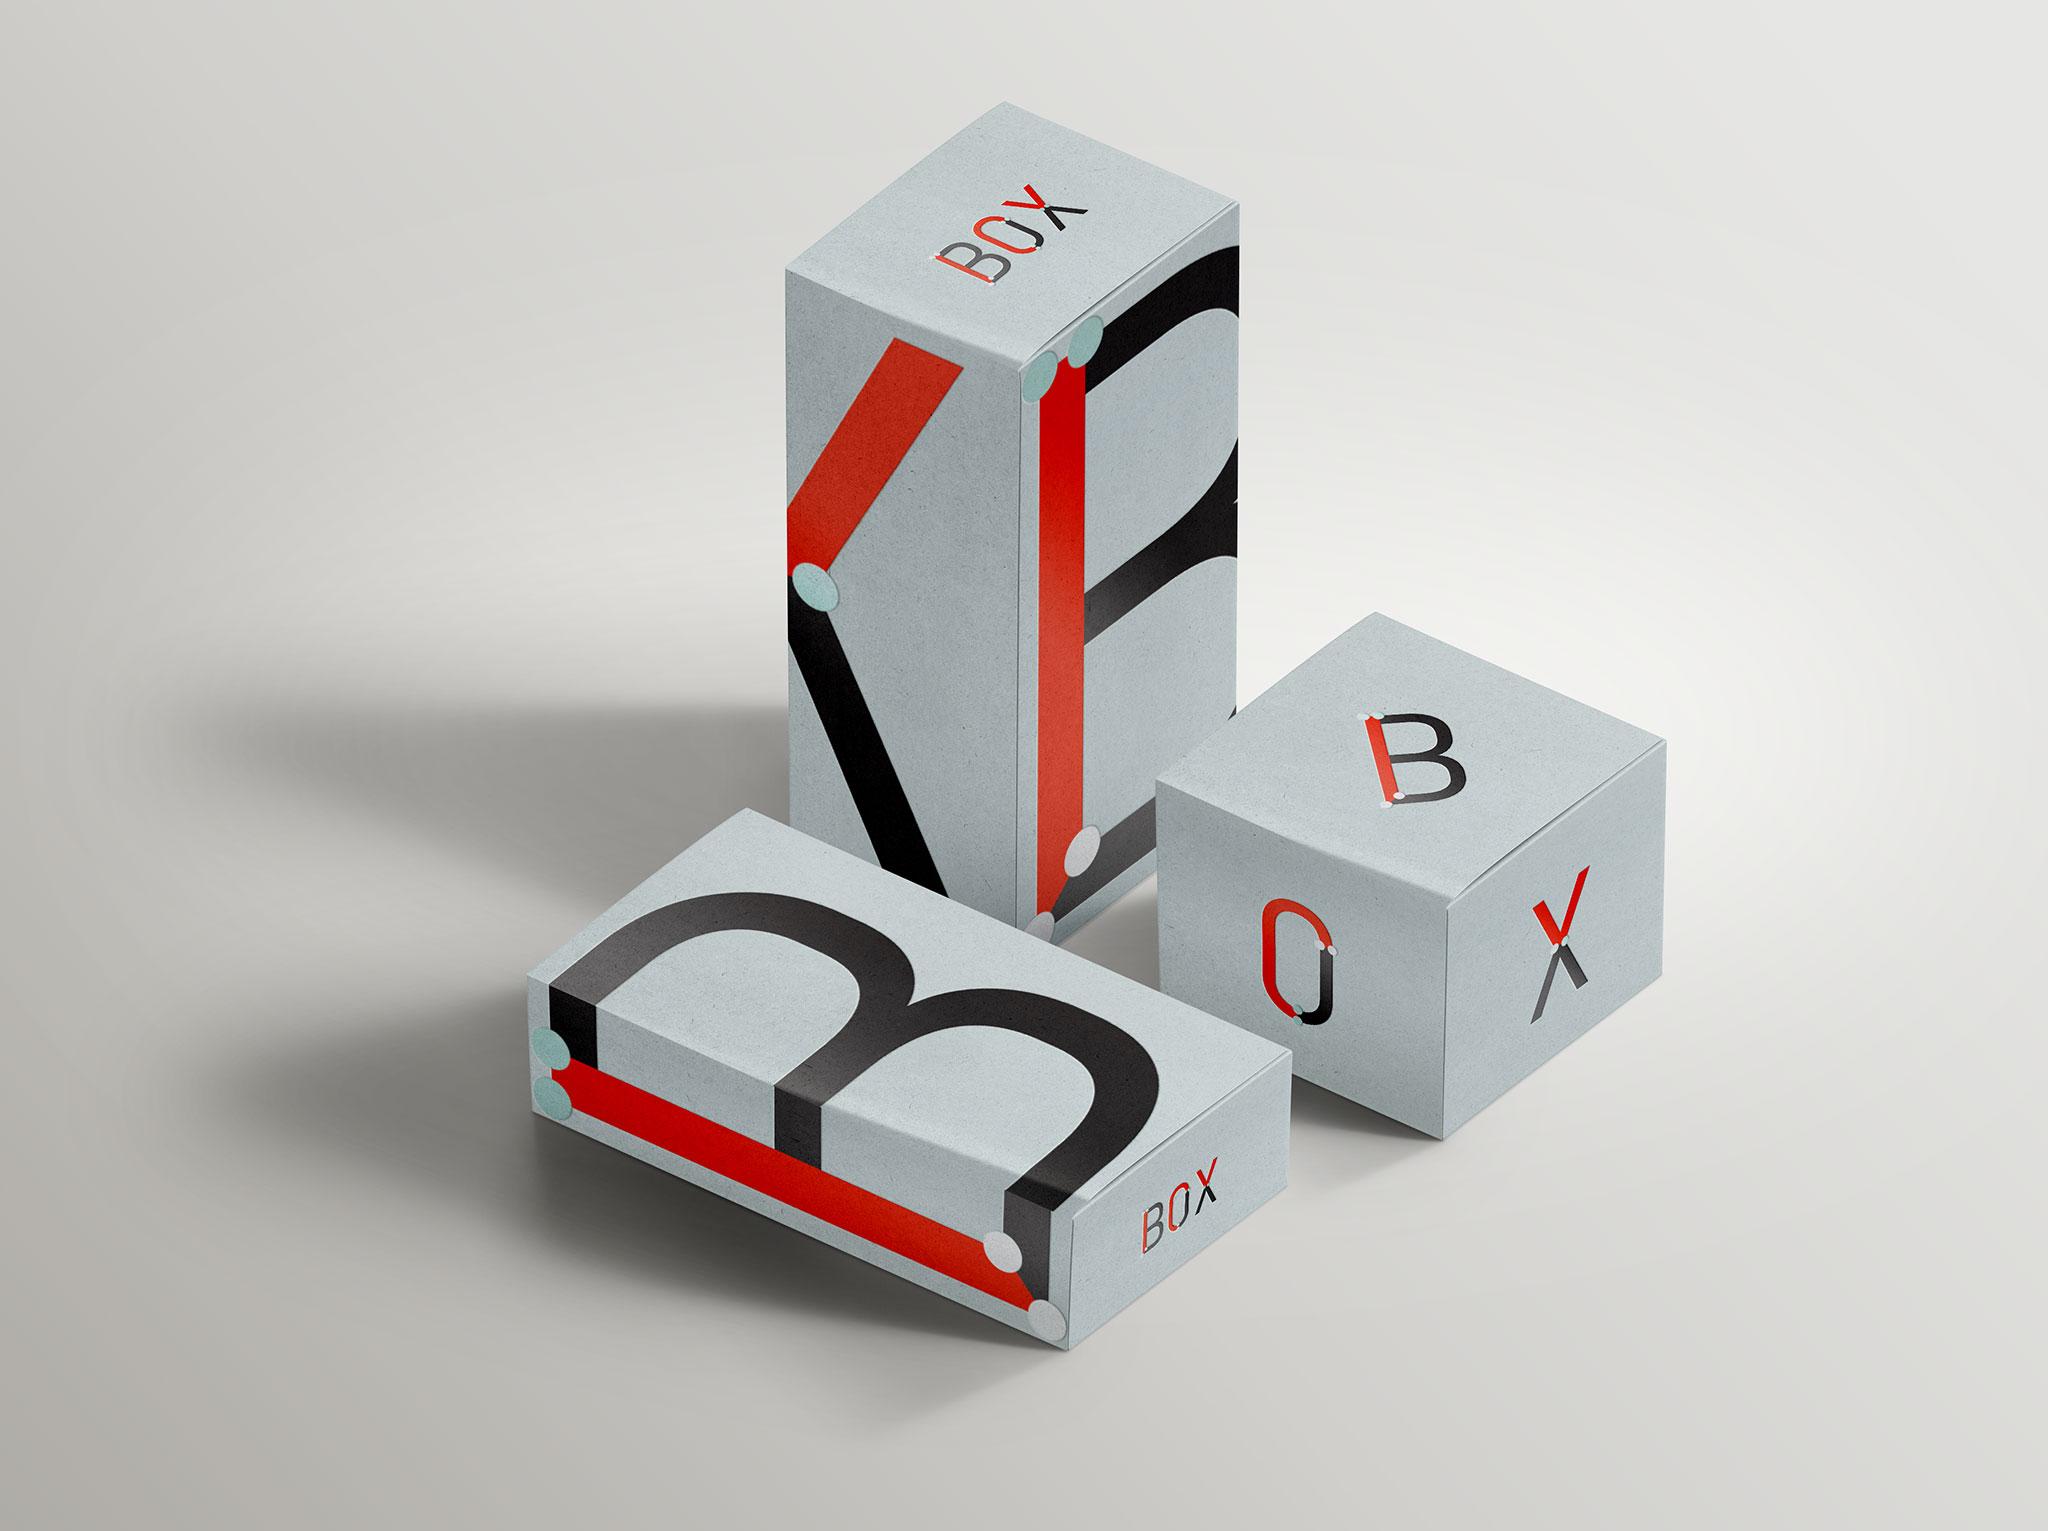 Spil Creative Architext font design on boxes